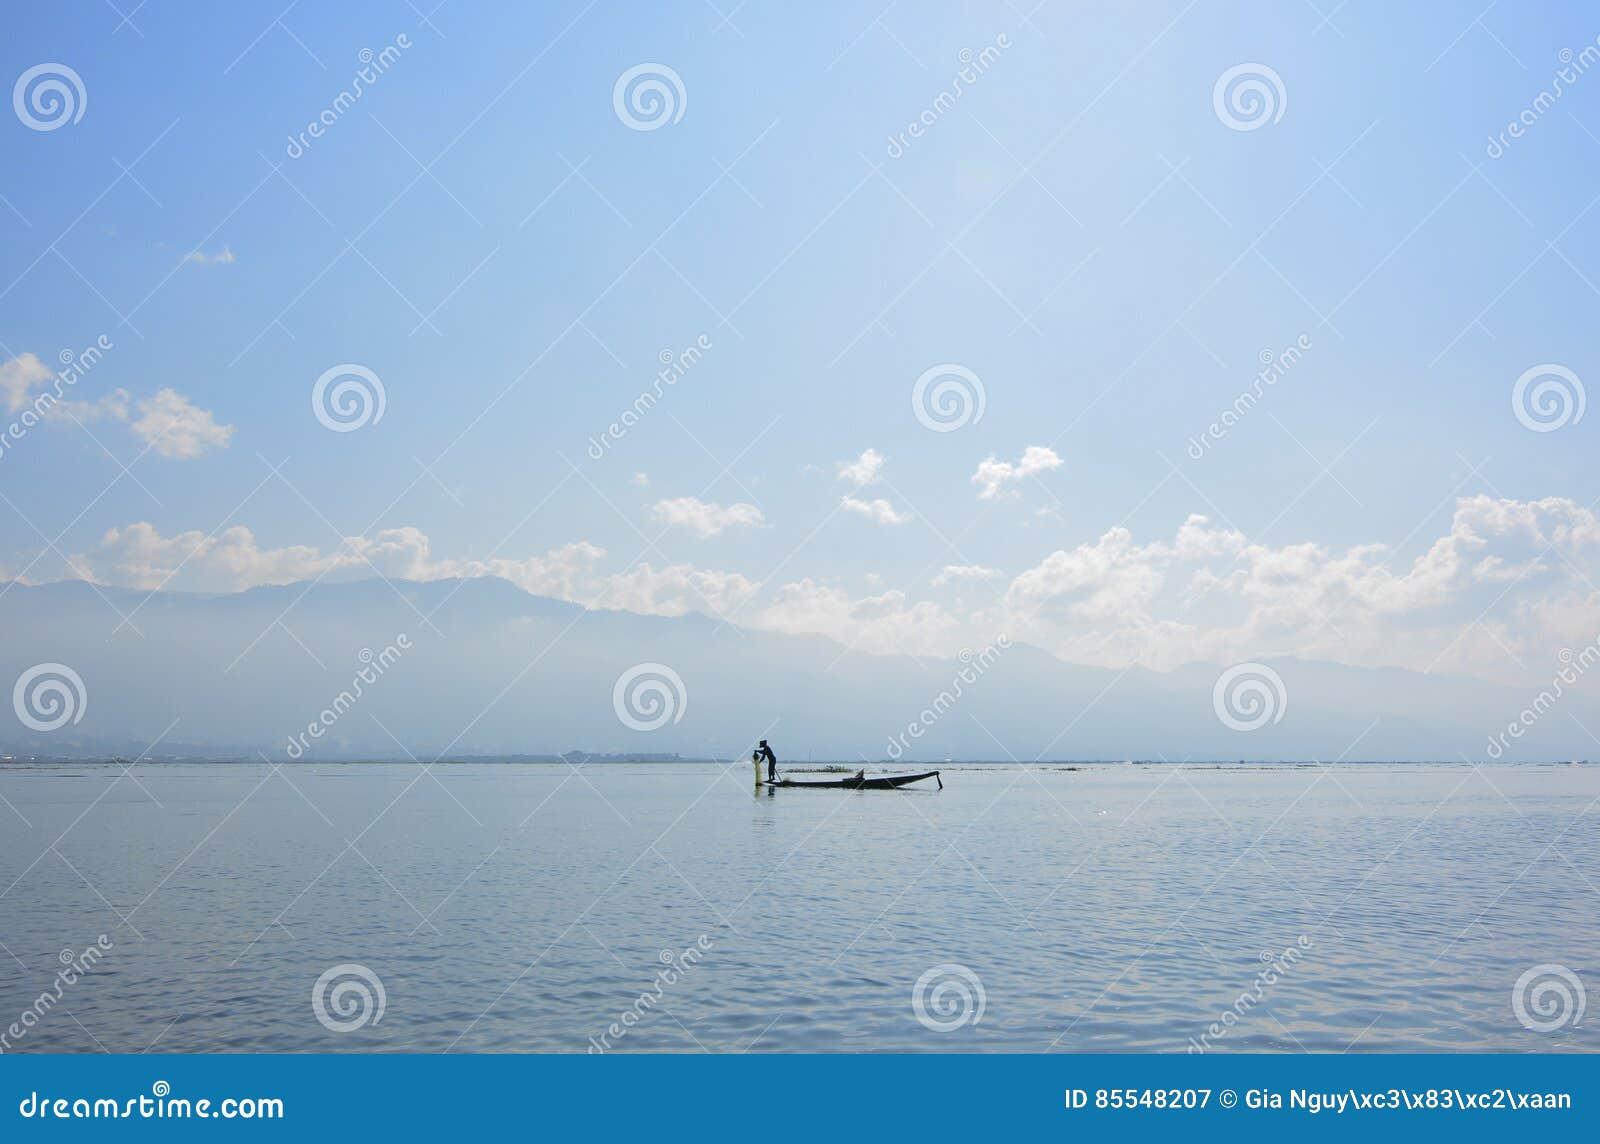 Inle Lake Boat Tour Stock Photo - Image: 92697938